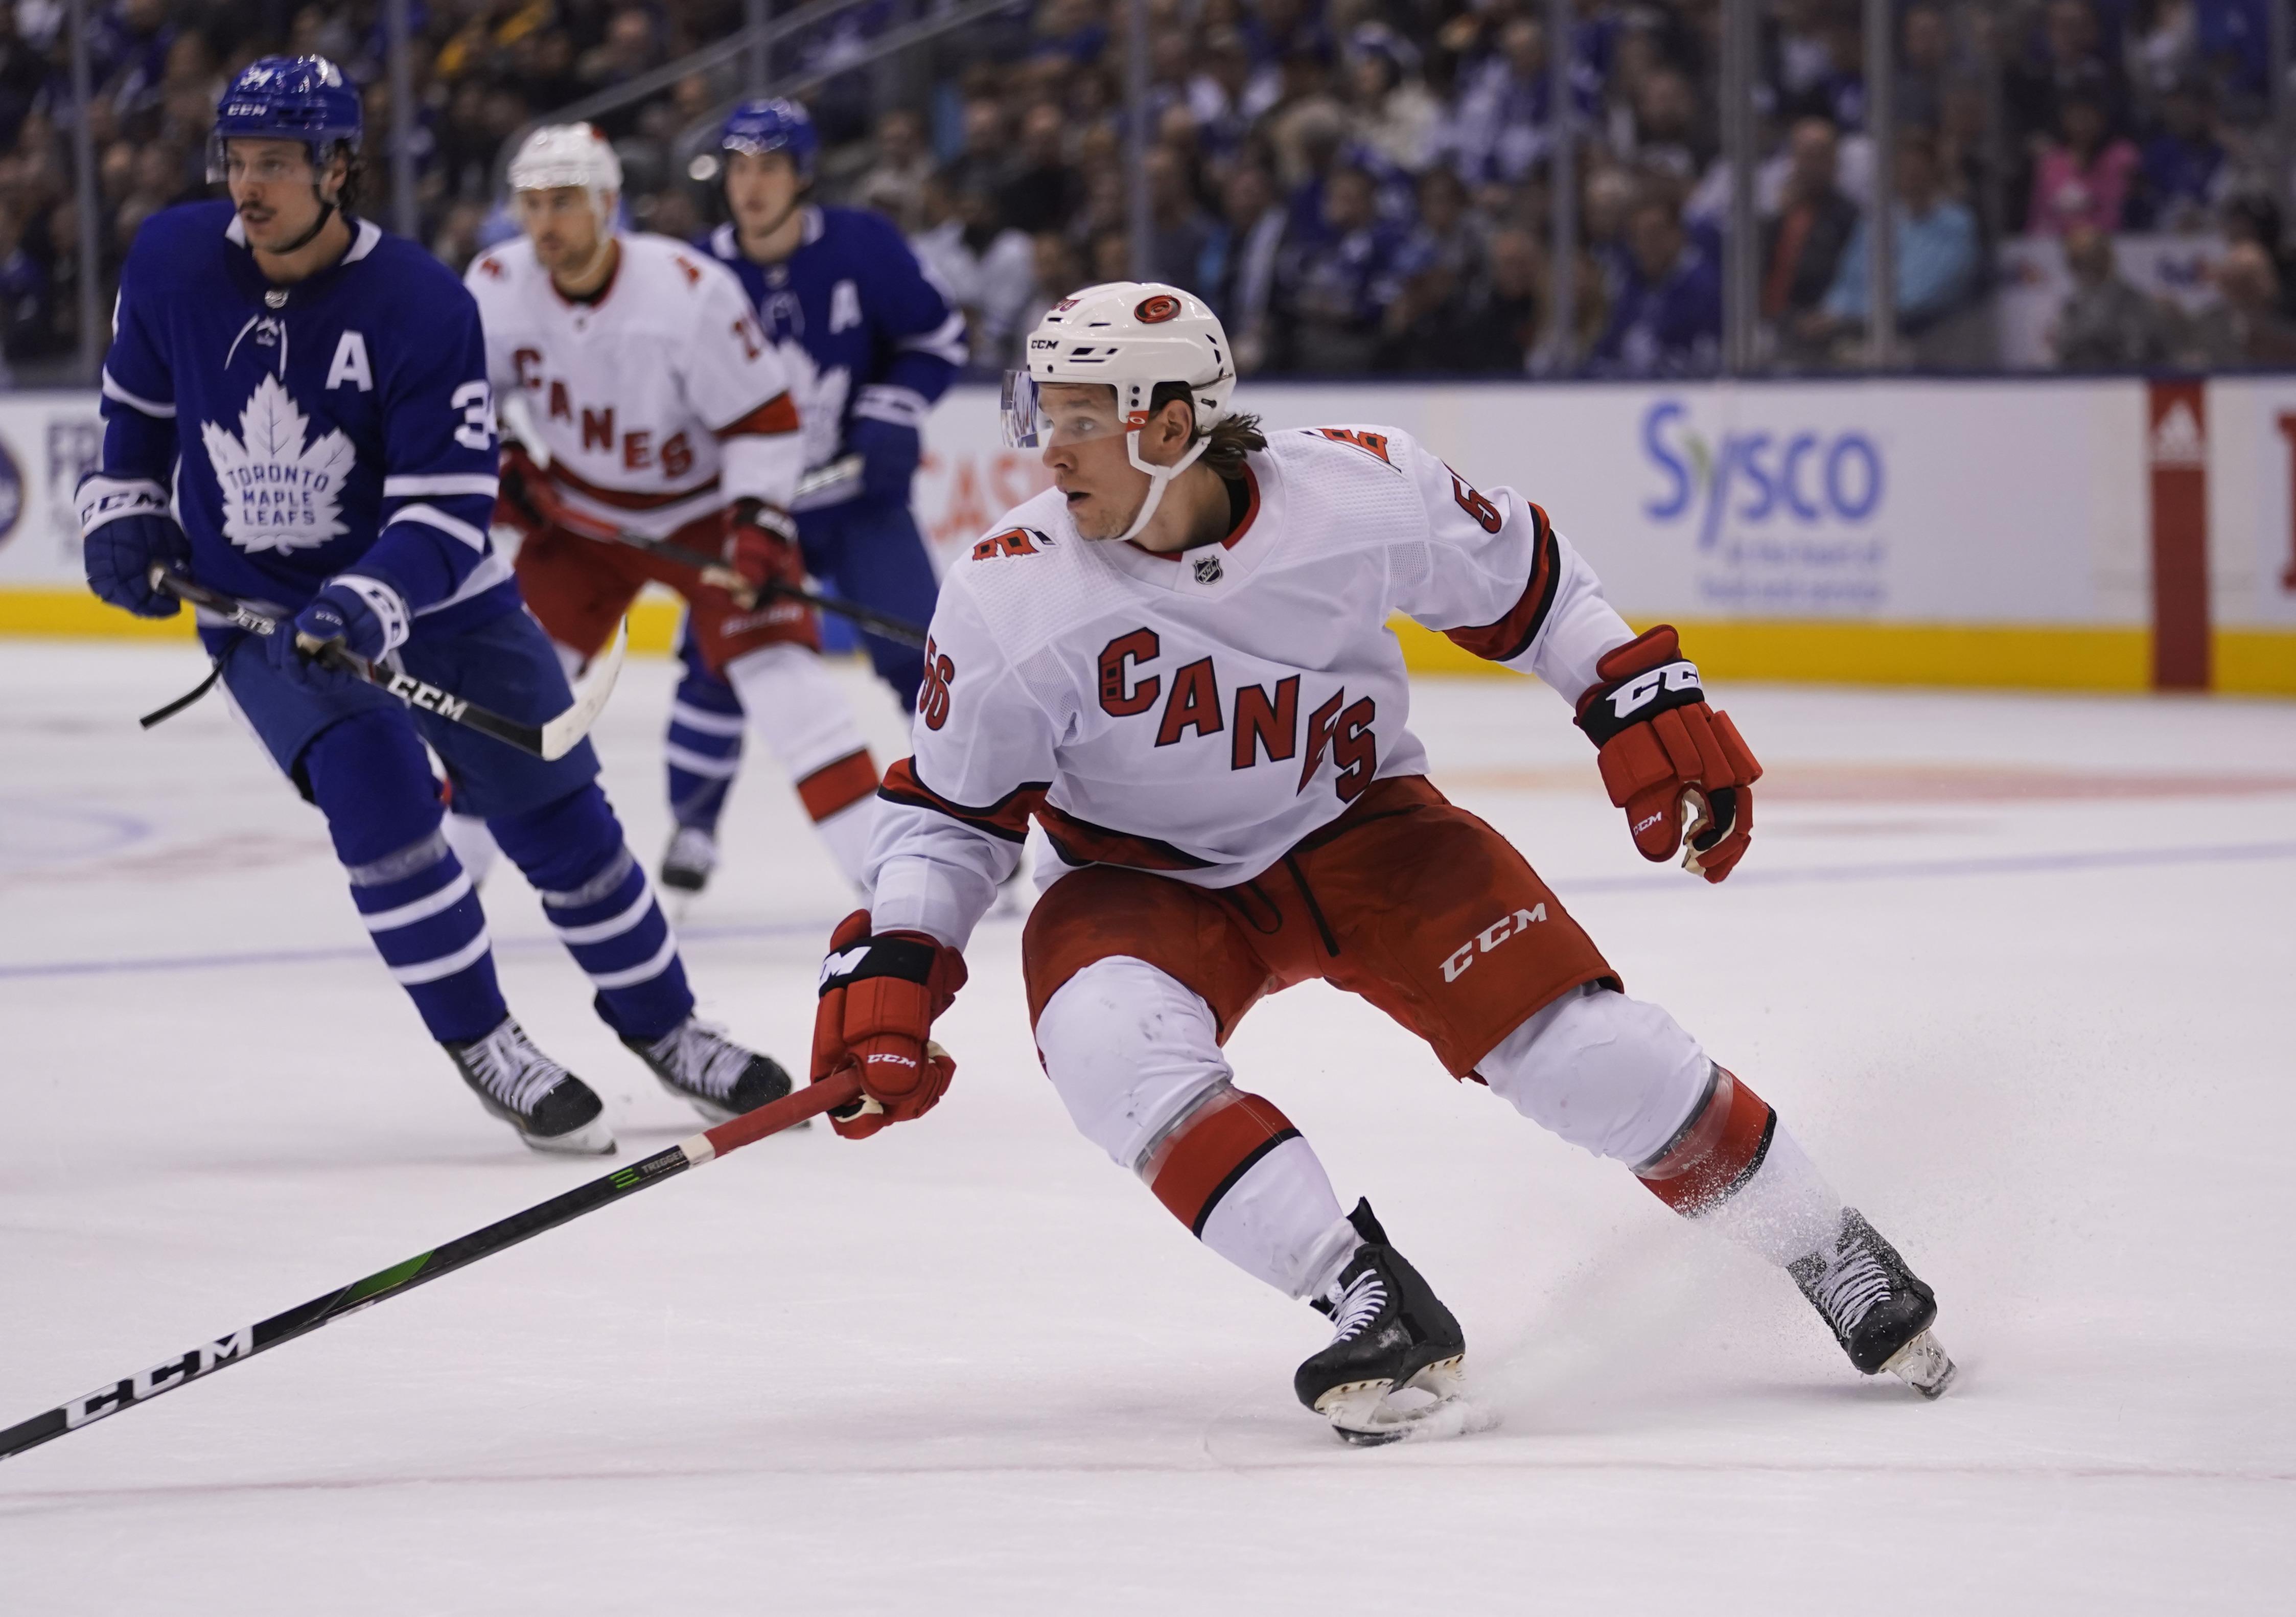 NHL: Carolina Hurricanes at Toronto Maple Leafs